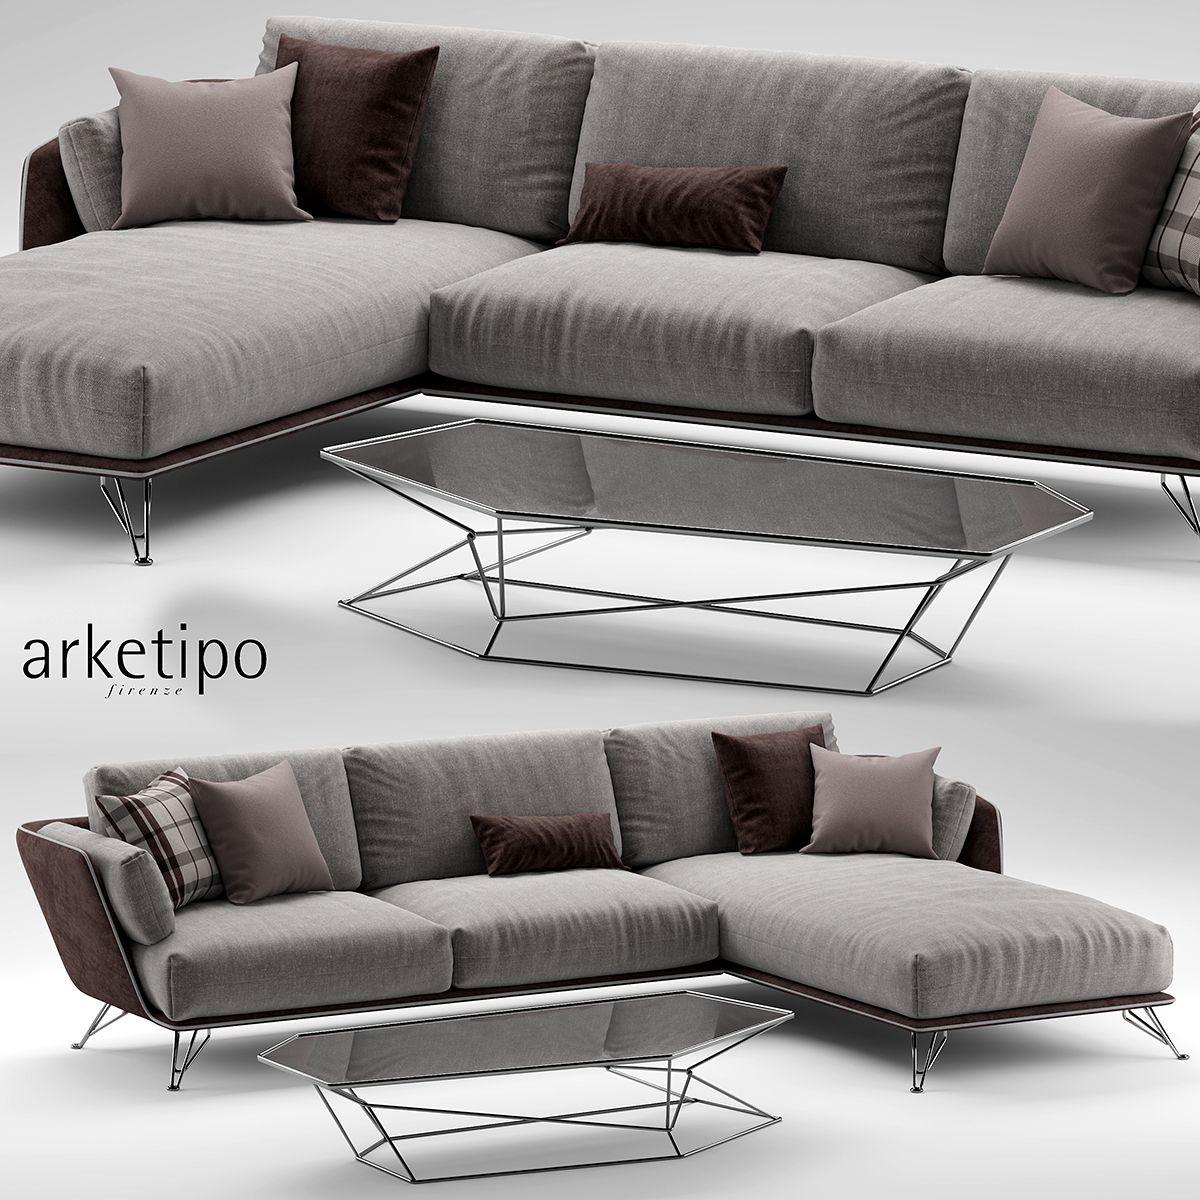 3d Model Arketipo Morrison Sofa 128 Free Download Sofa Furniture Classic Sofa